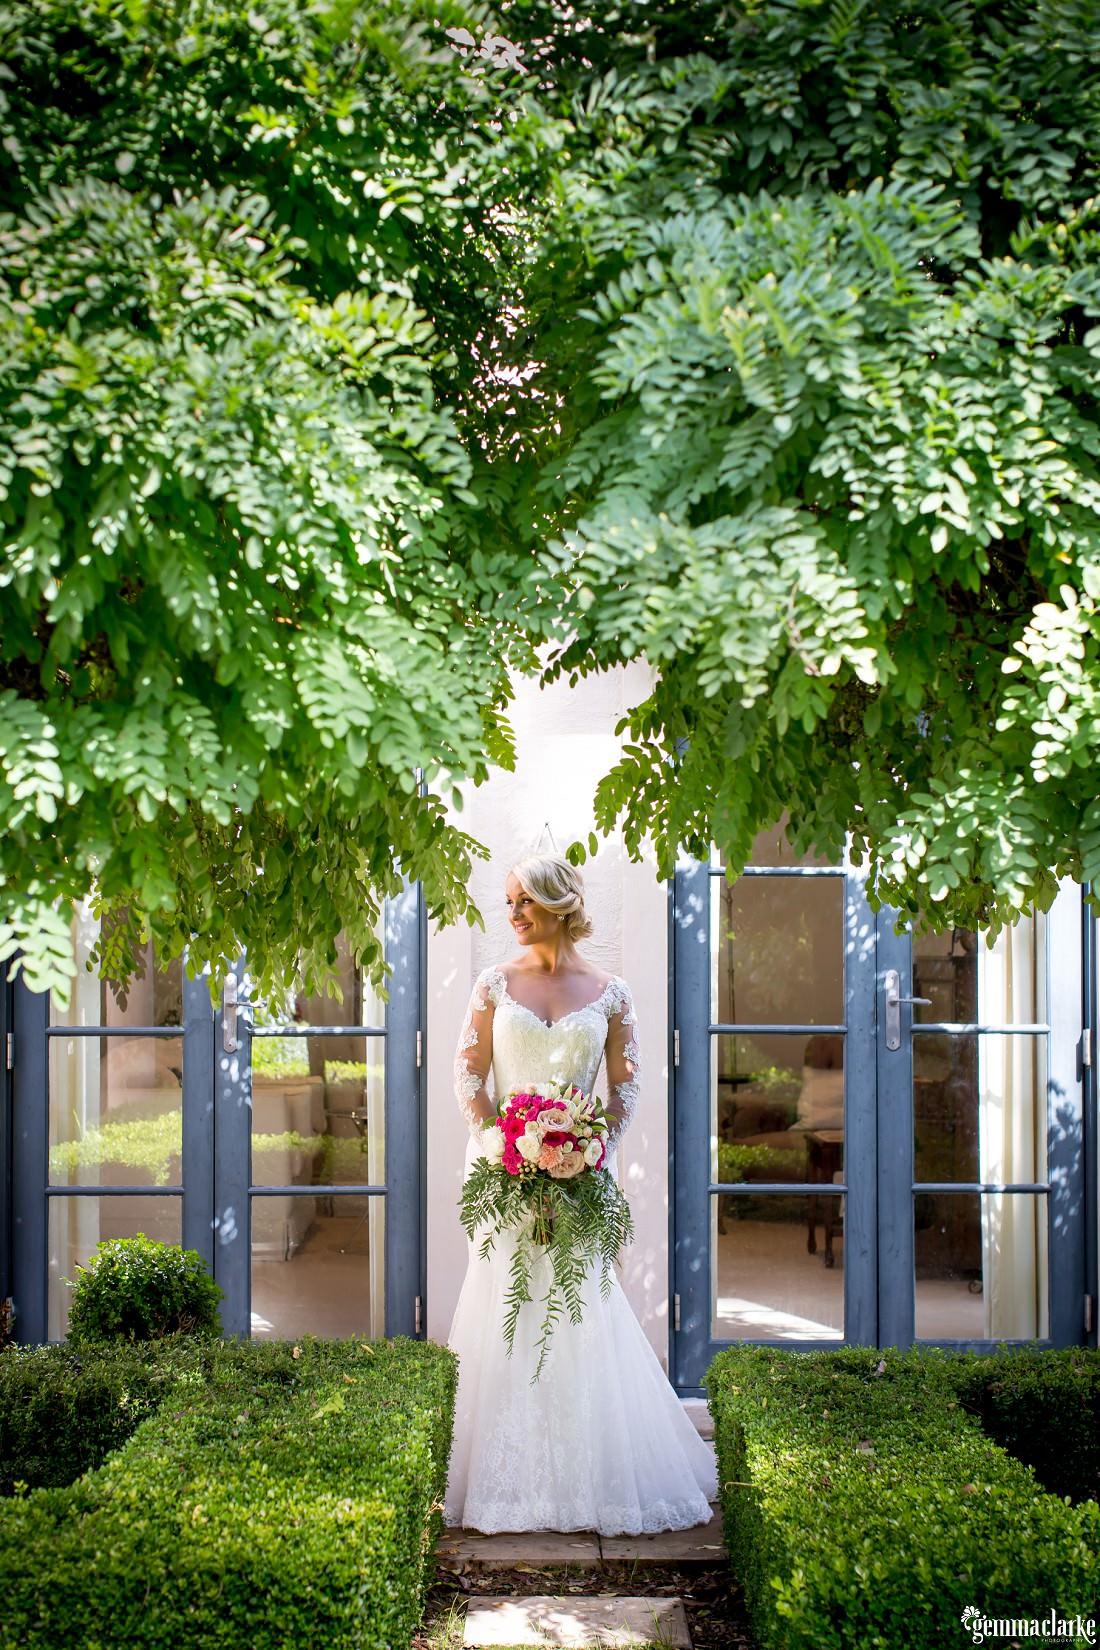 A bride holding a bouquet standing in a garden